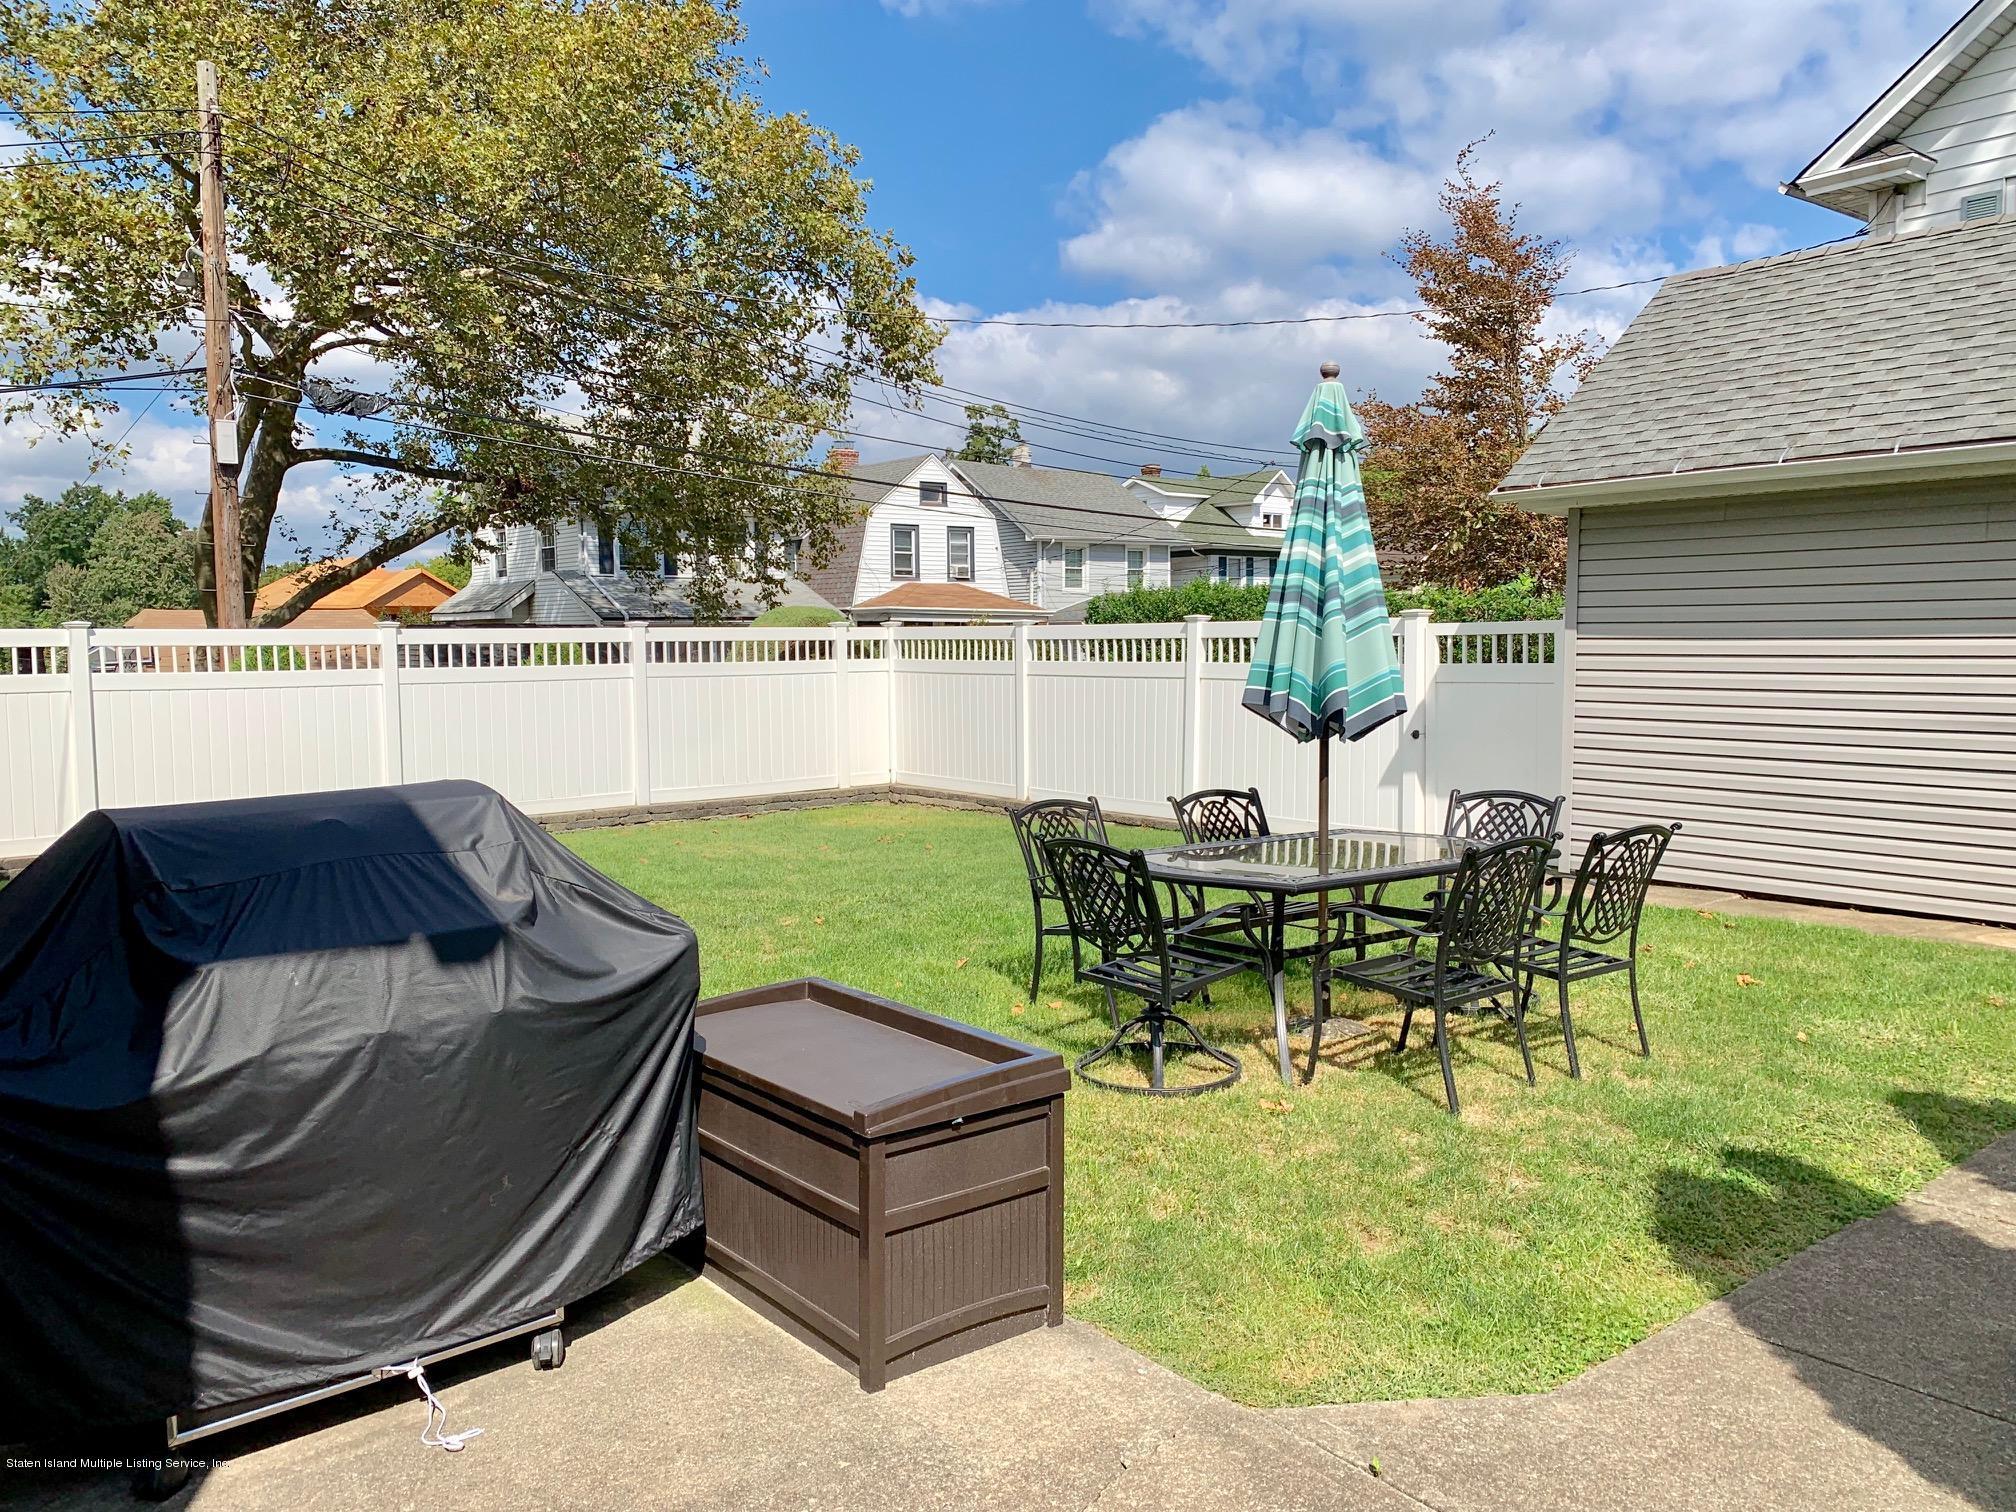 Single Family - Detached 195 Fairview Avenue  Staten Island, NY 10314, MLS-1132423-37